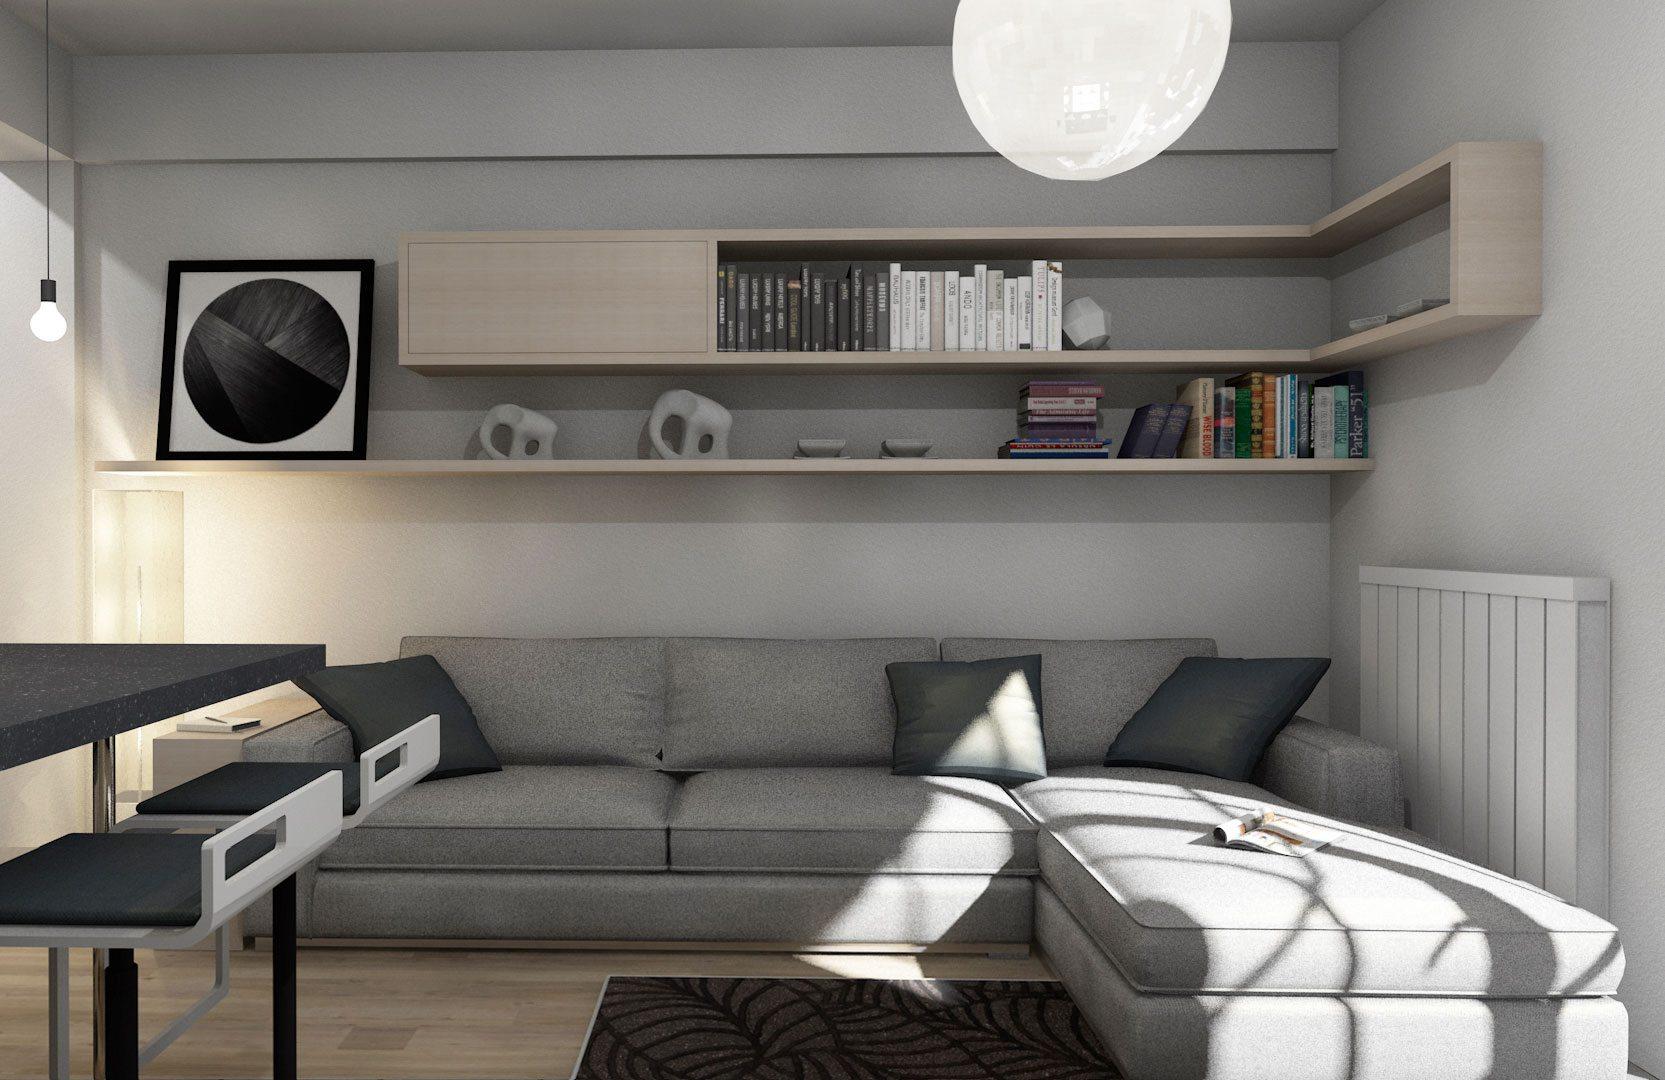 archicostudio_ren-kn16_sofa